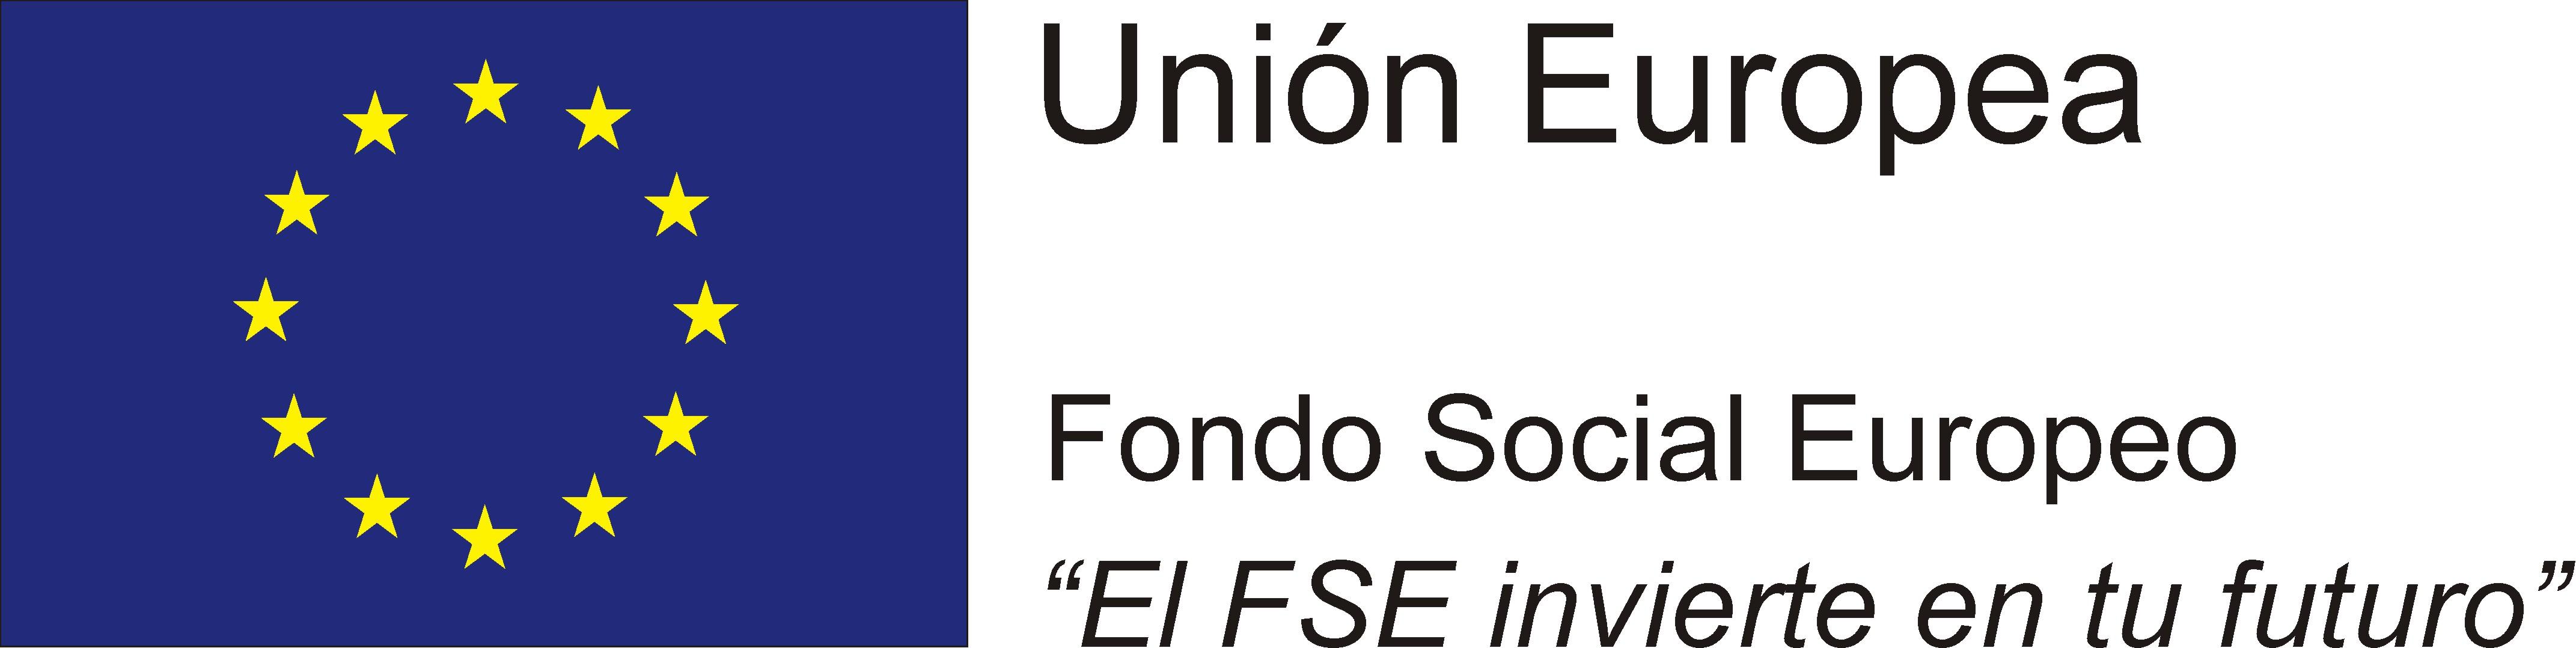 UE_FONDOSFPB